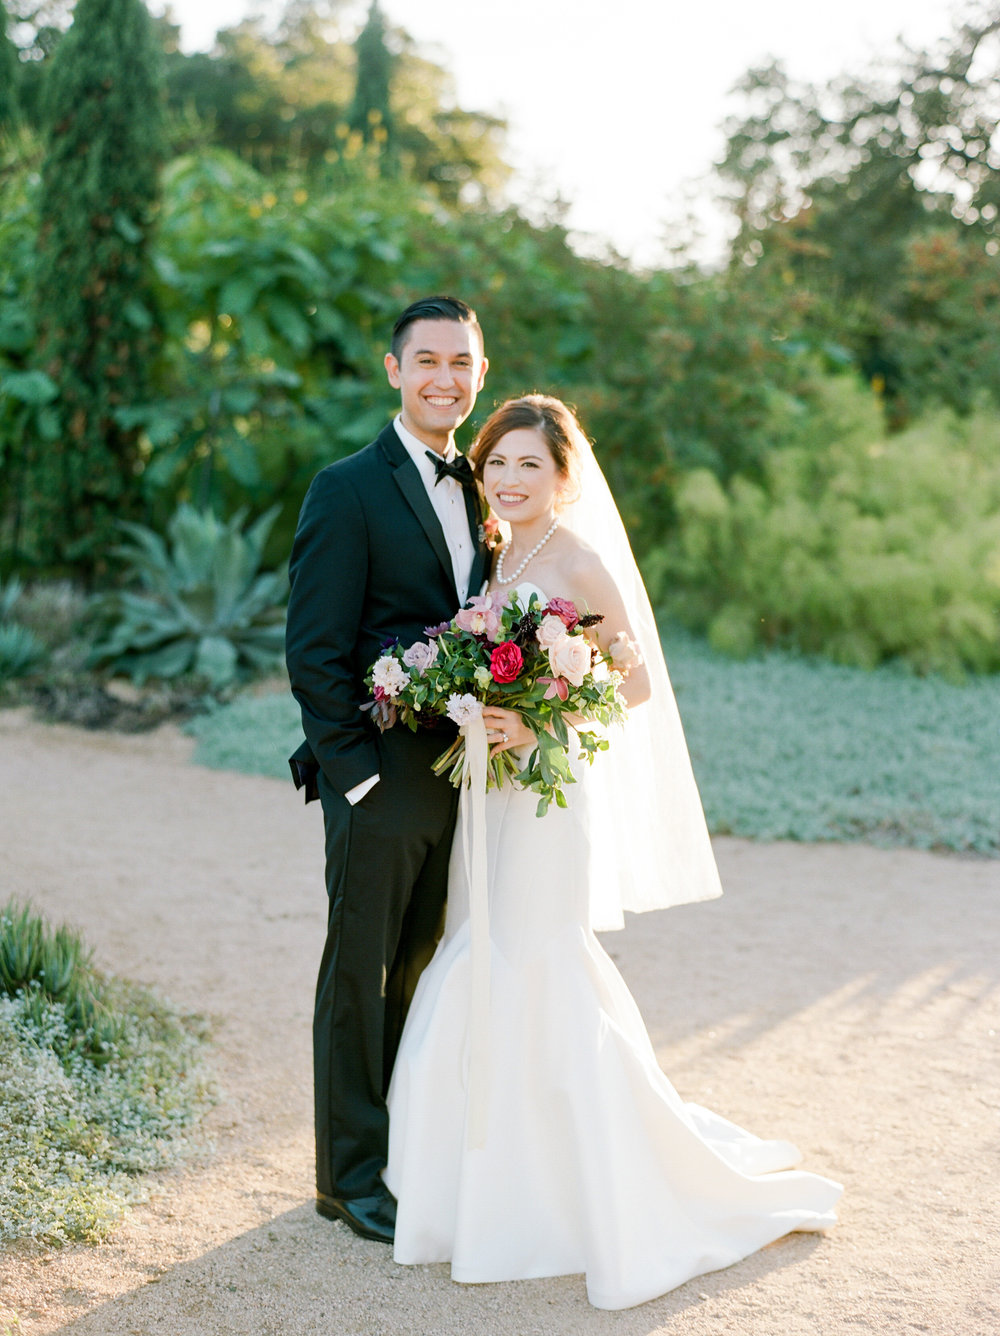 The-Knot-Texas-Magazine-Wedding-Top-Best-Houston-Wedding-Photographer-Fine-Art-Film-Dana-Fernandez-Photography-118.jpg